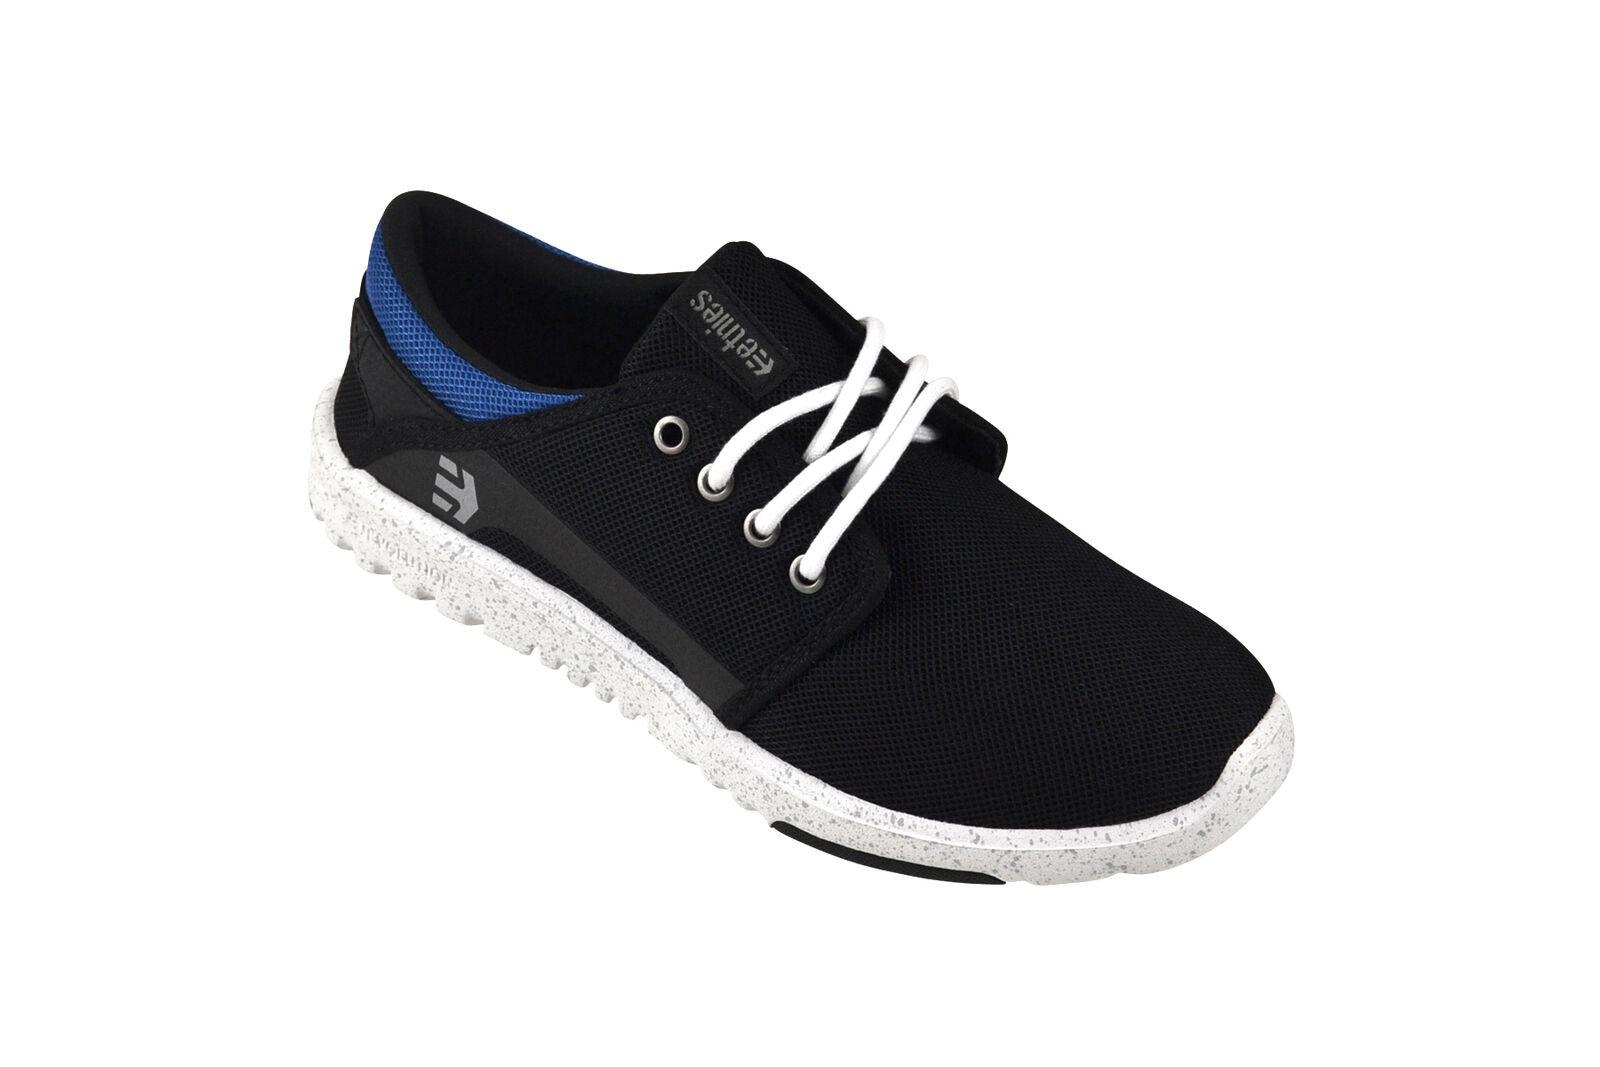 Billig hohe Qualität Etnies Scout black/blue/black Sneaker/Schuhe schwarz